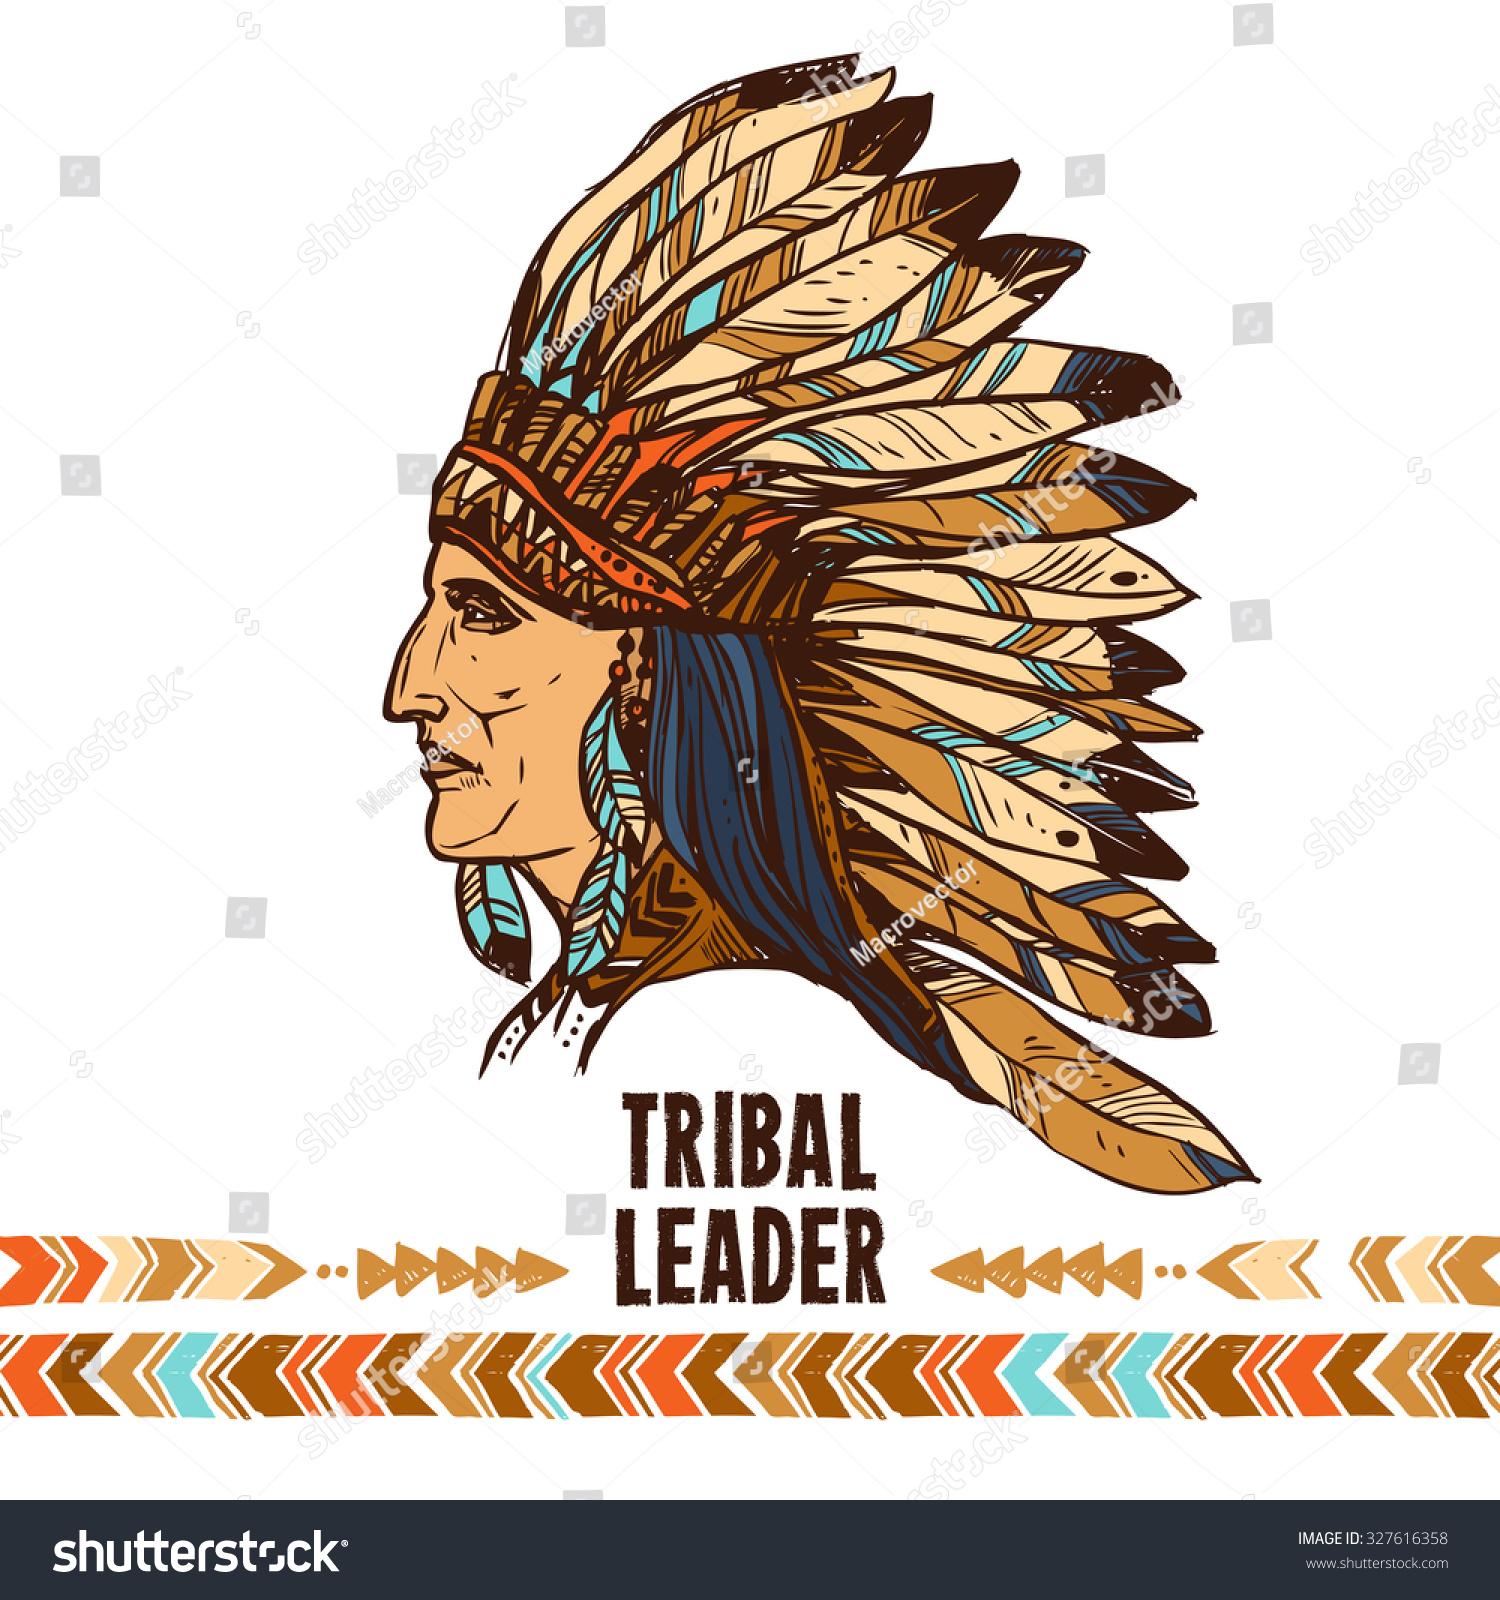 Native american apache indian profile tribal stock illustration native american apache indian profile in tribal costume sketch portrait illustration biocorpaavc